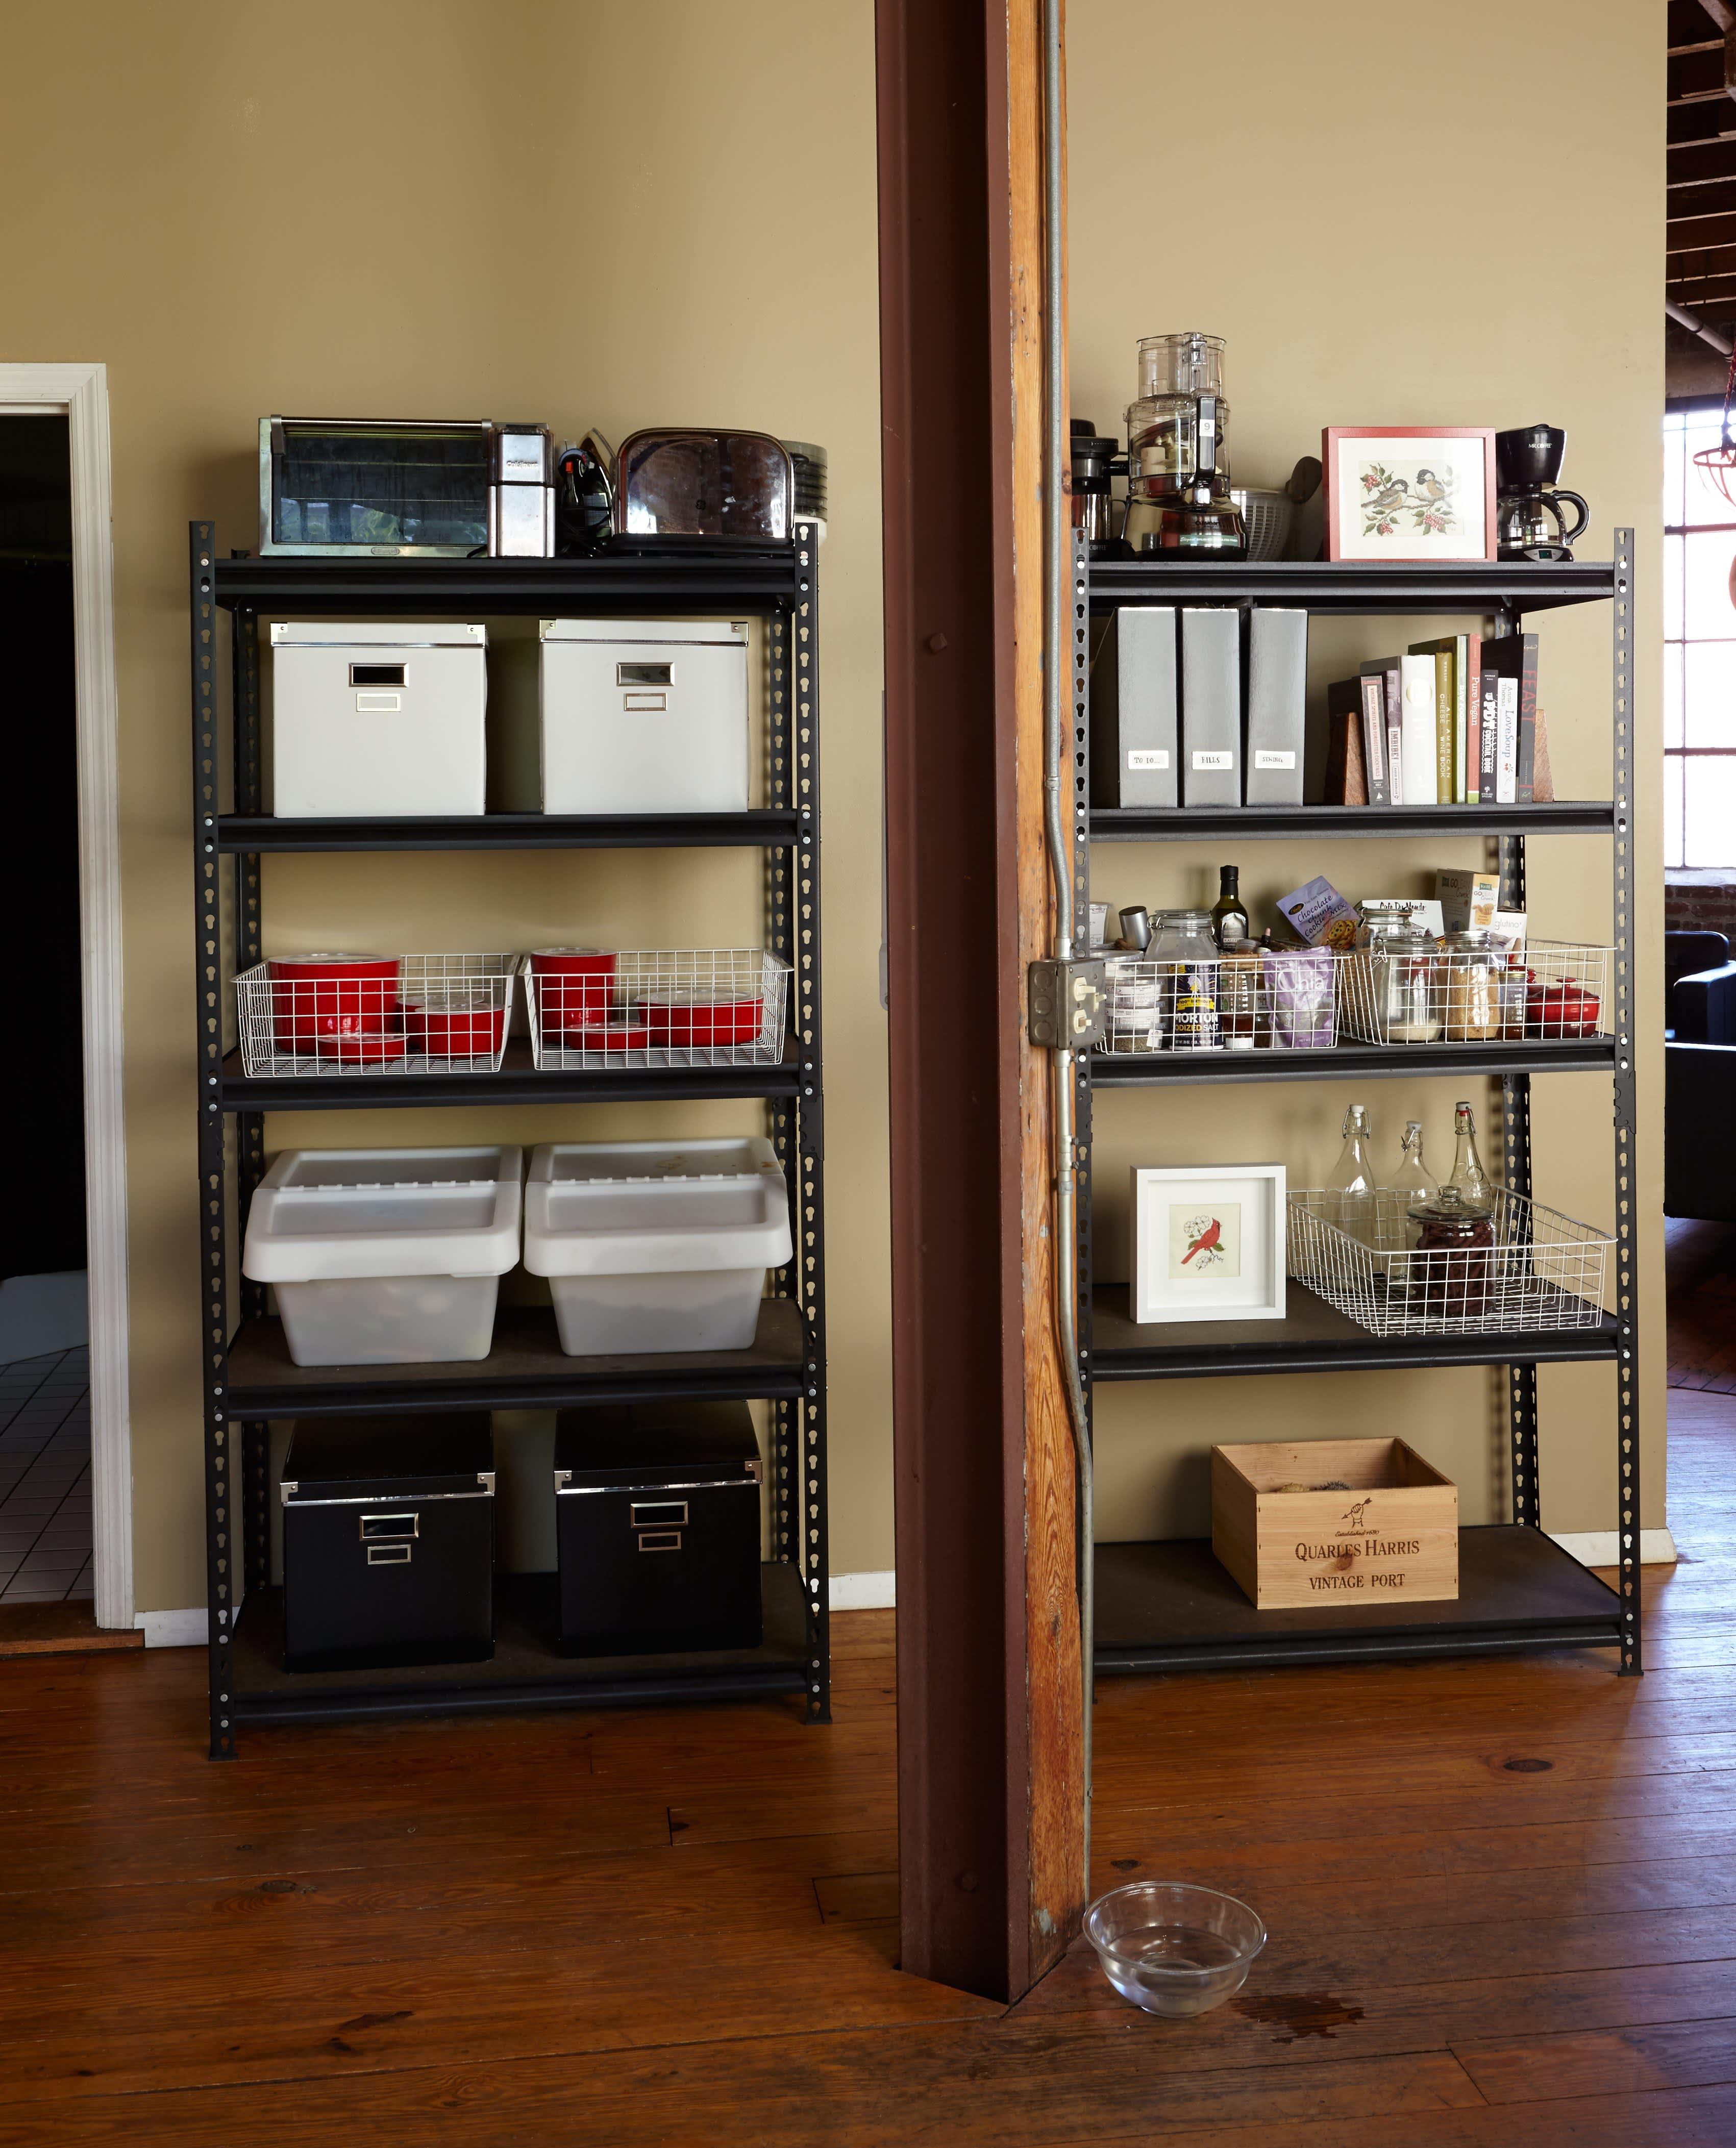 Julia's Open, Antique-Industrial Atlanta Kitchen: gallery image 16